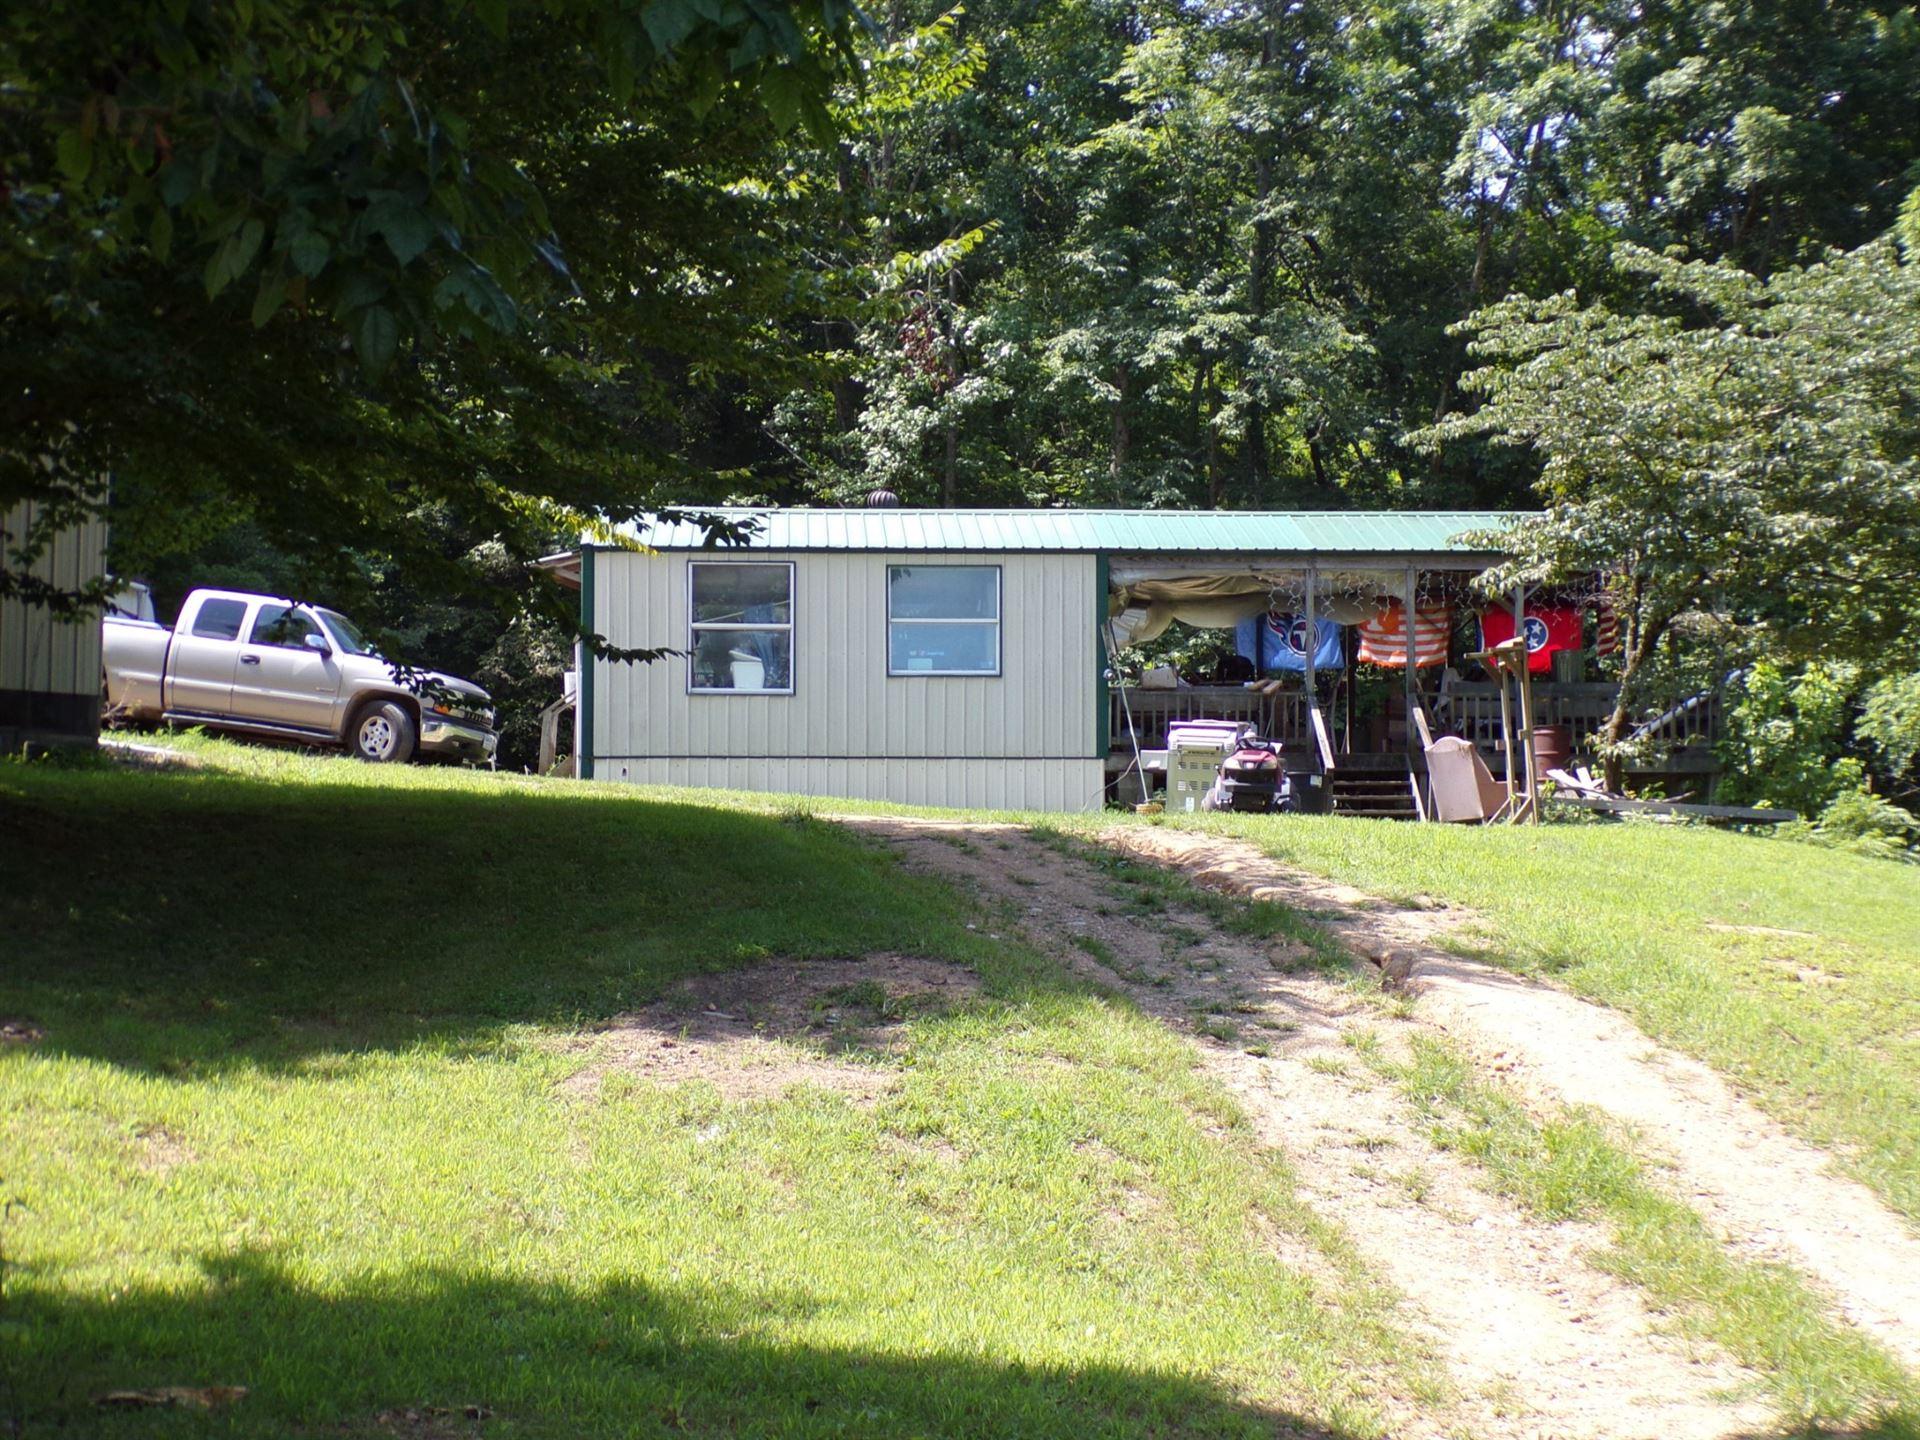 860 Jones Hollow Rd, Lobelville, TN 37097 - MLS#: 2283144